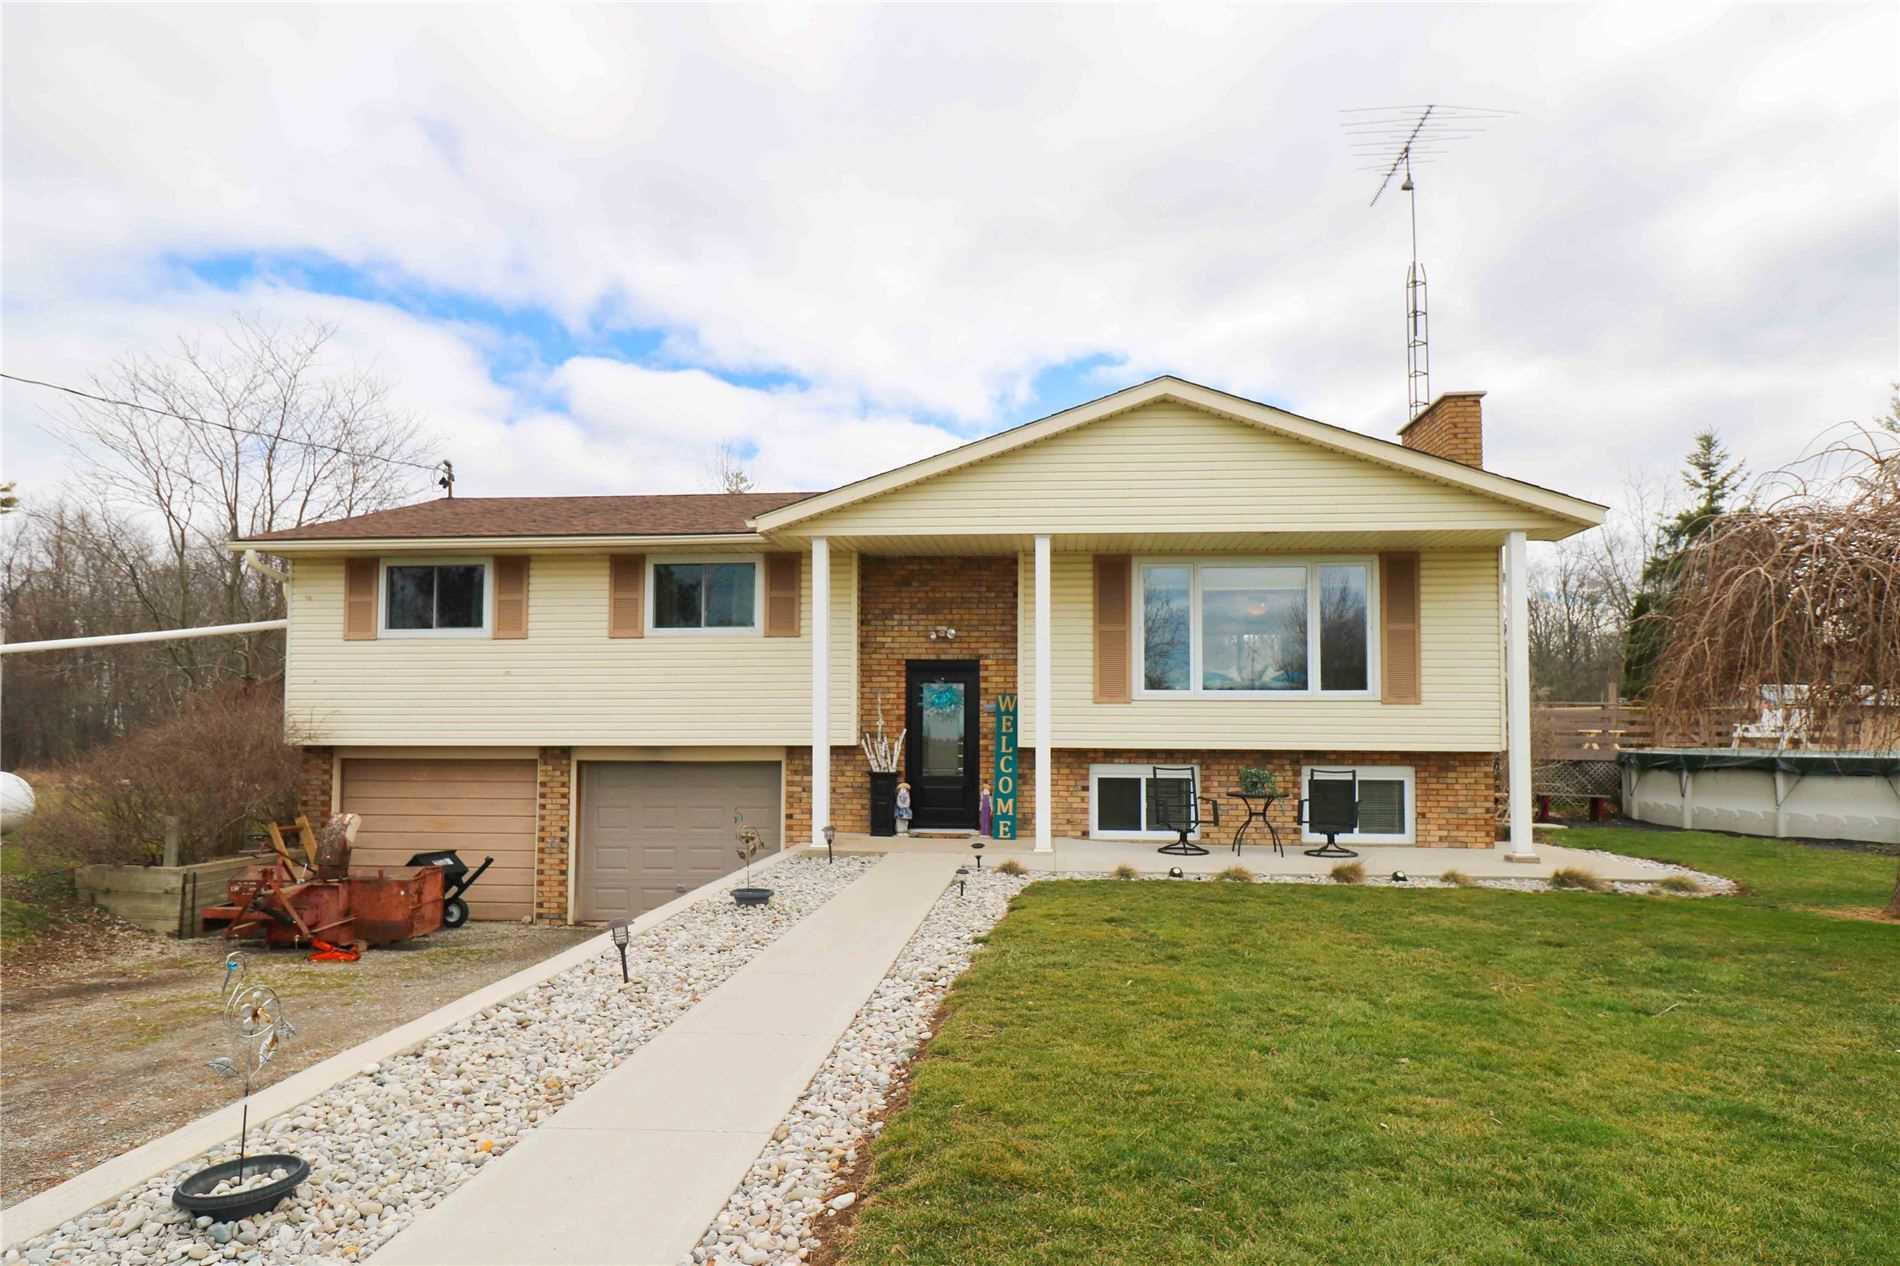 1680 Kohler Rd, Haldimand, Ontario N0A 1E0, 3 Bedrooms Bedrooms, ,2 BathroomsBathrooms,Detached,For Sale,Kohler,X5173023